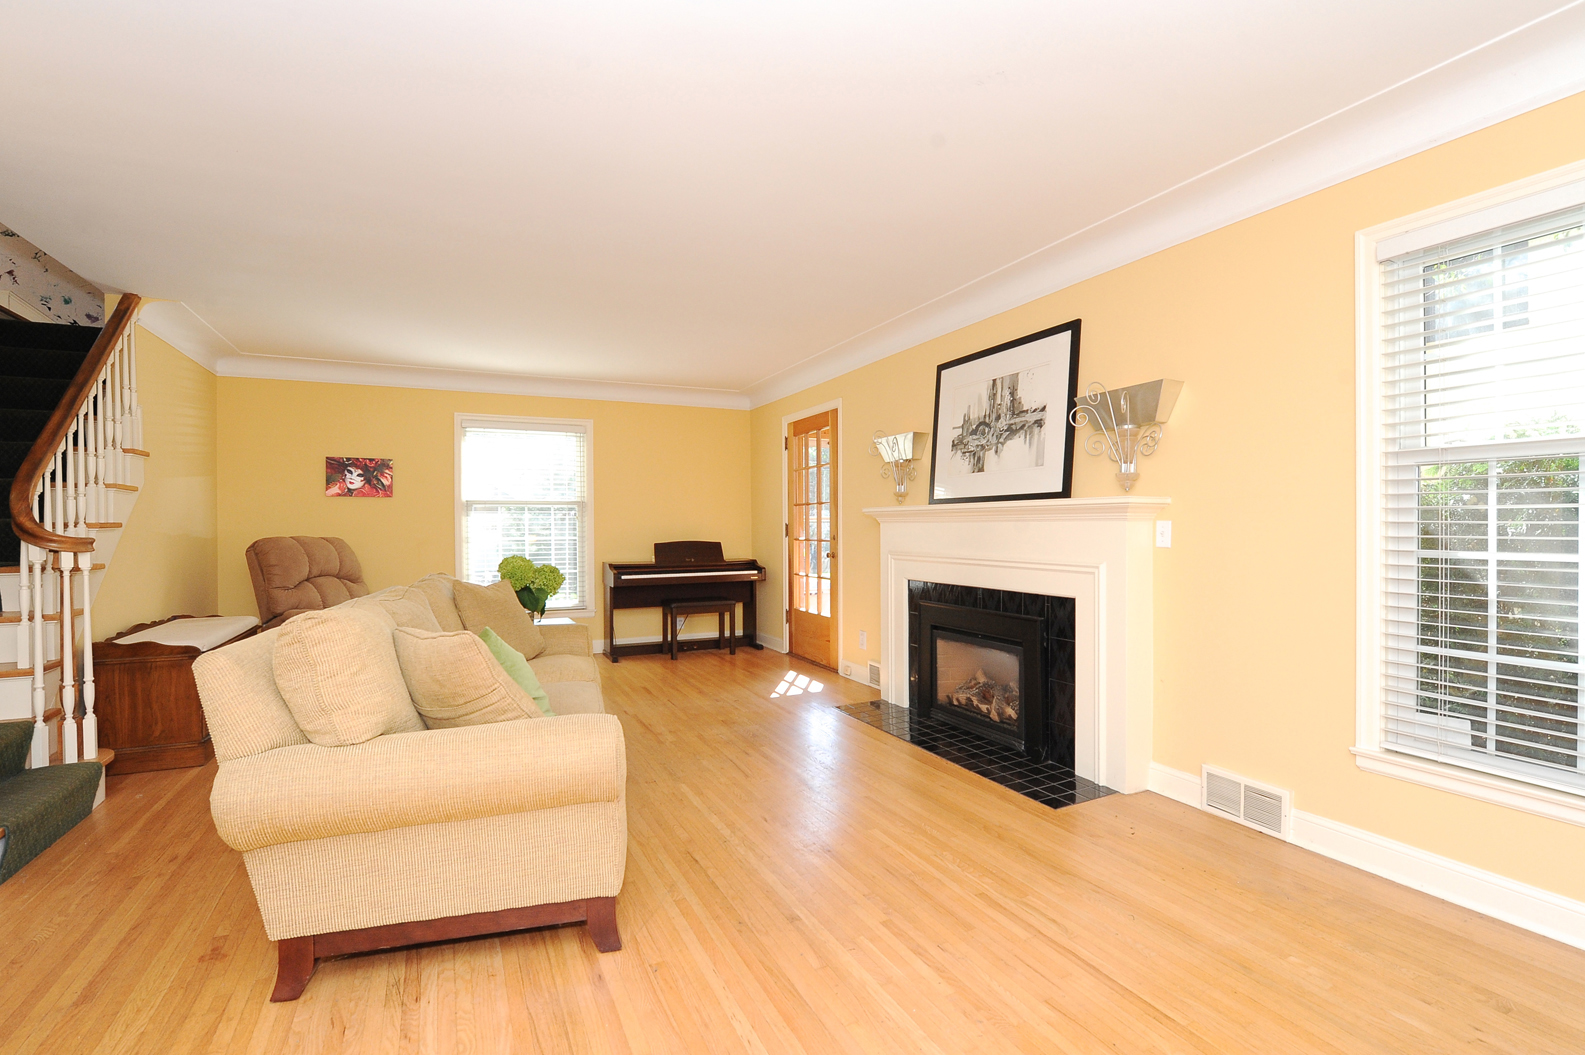 2. Living room 1